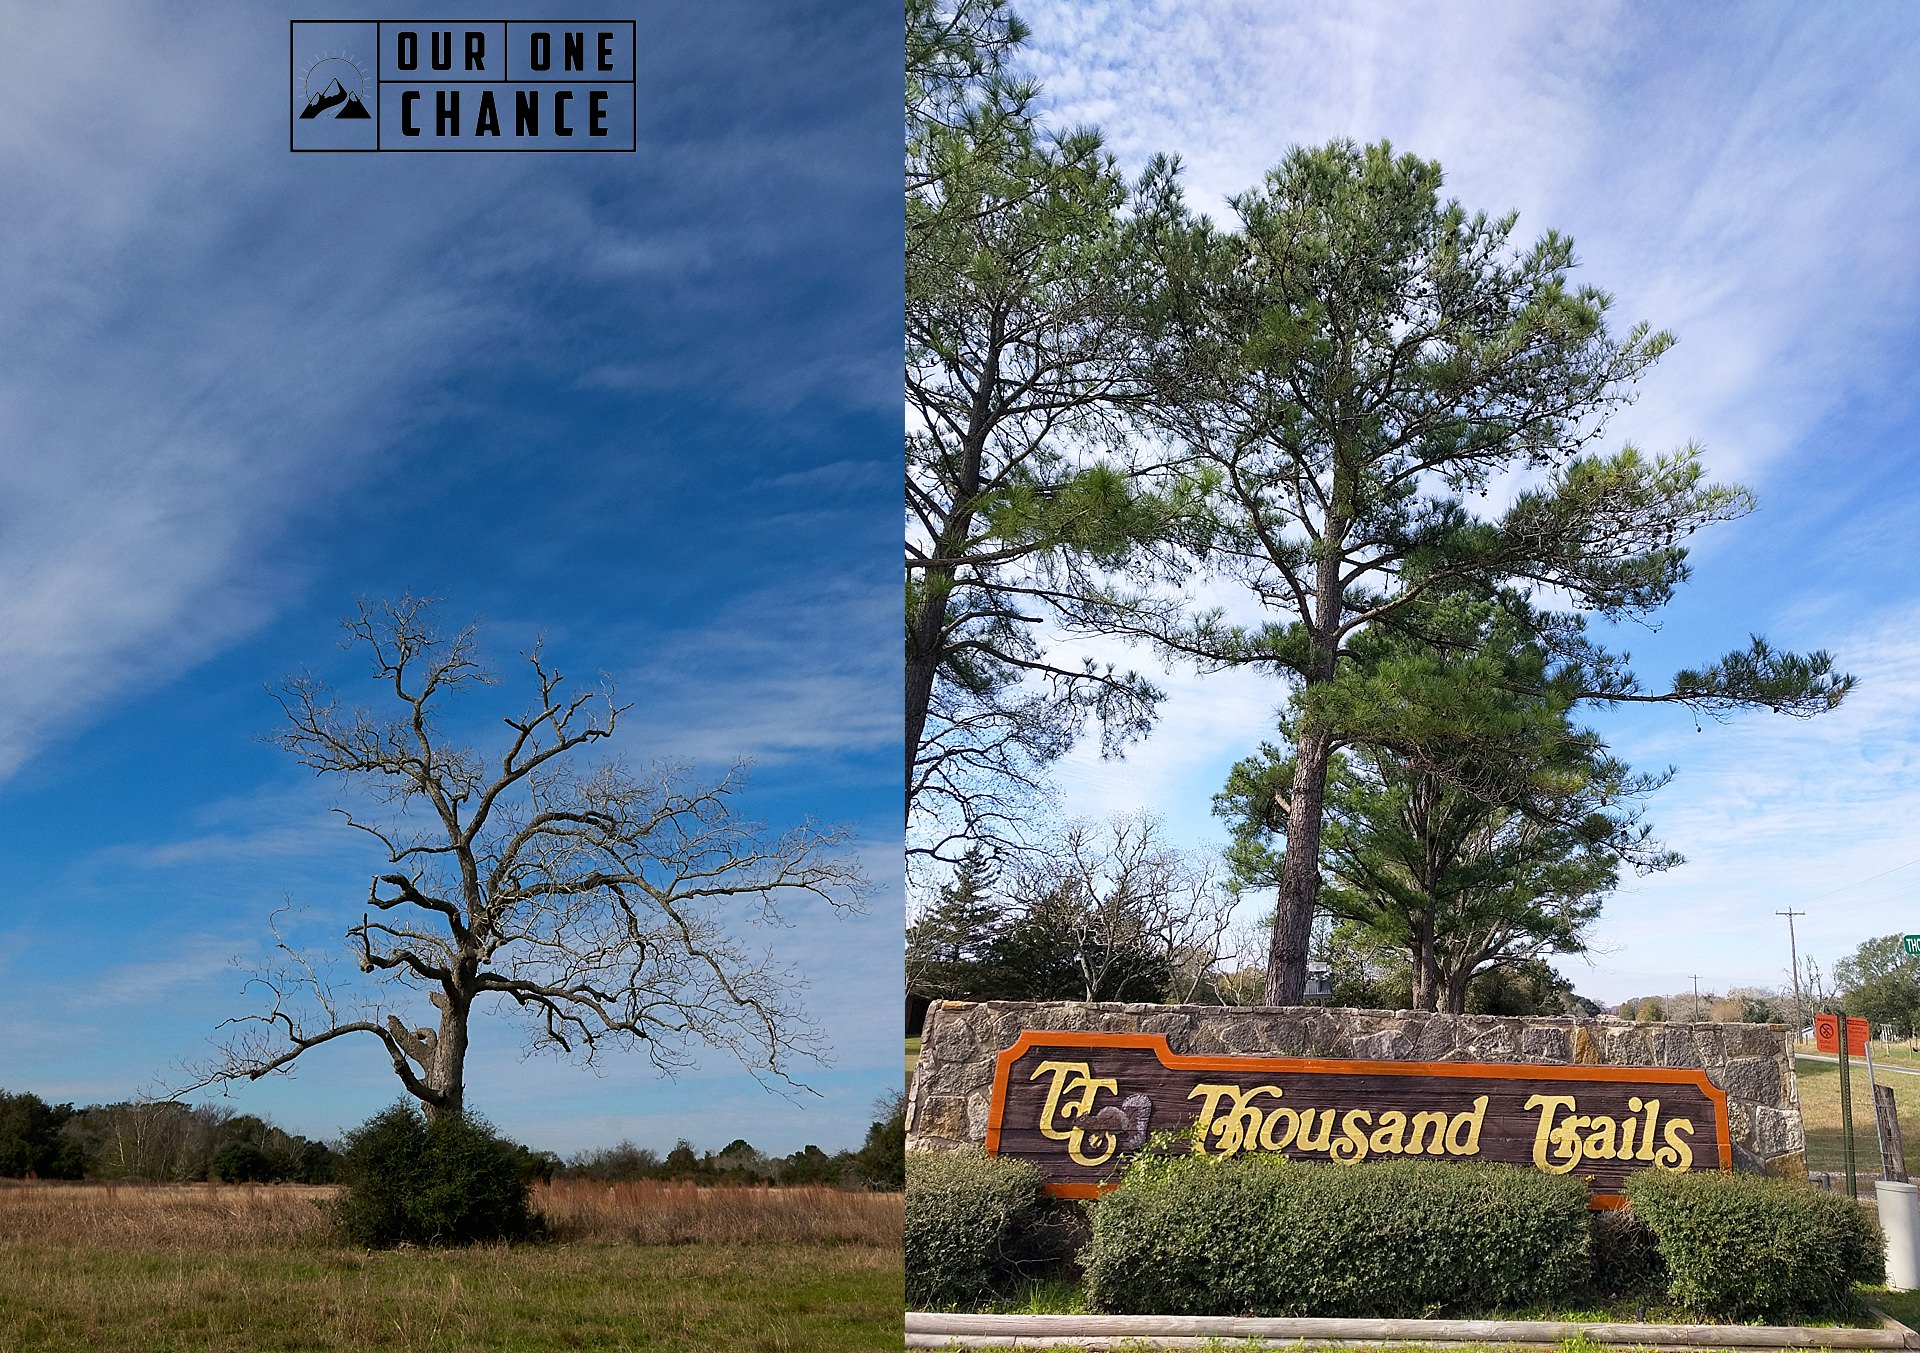 RV Across the Country Texas_0001